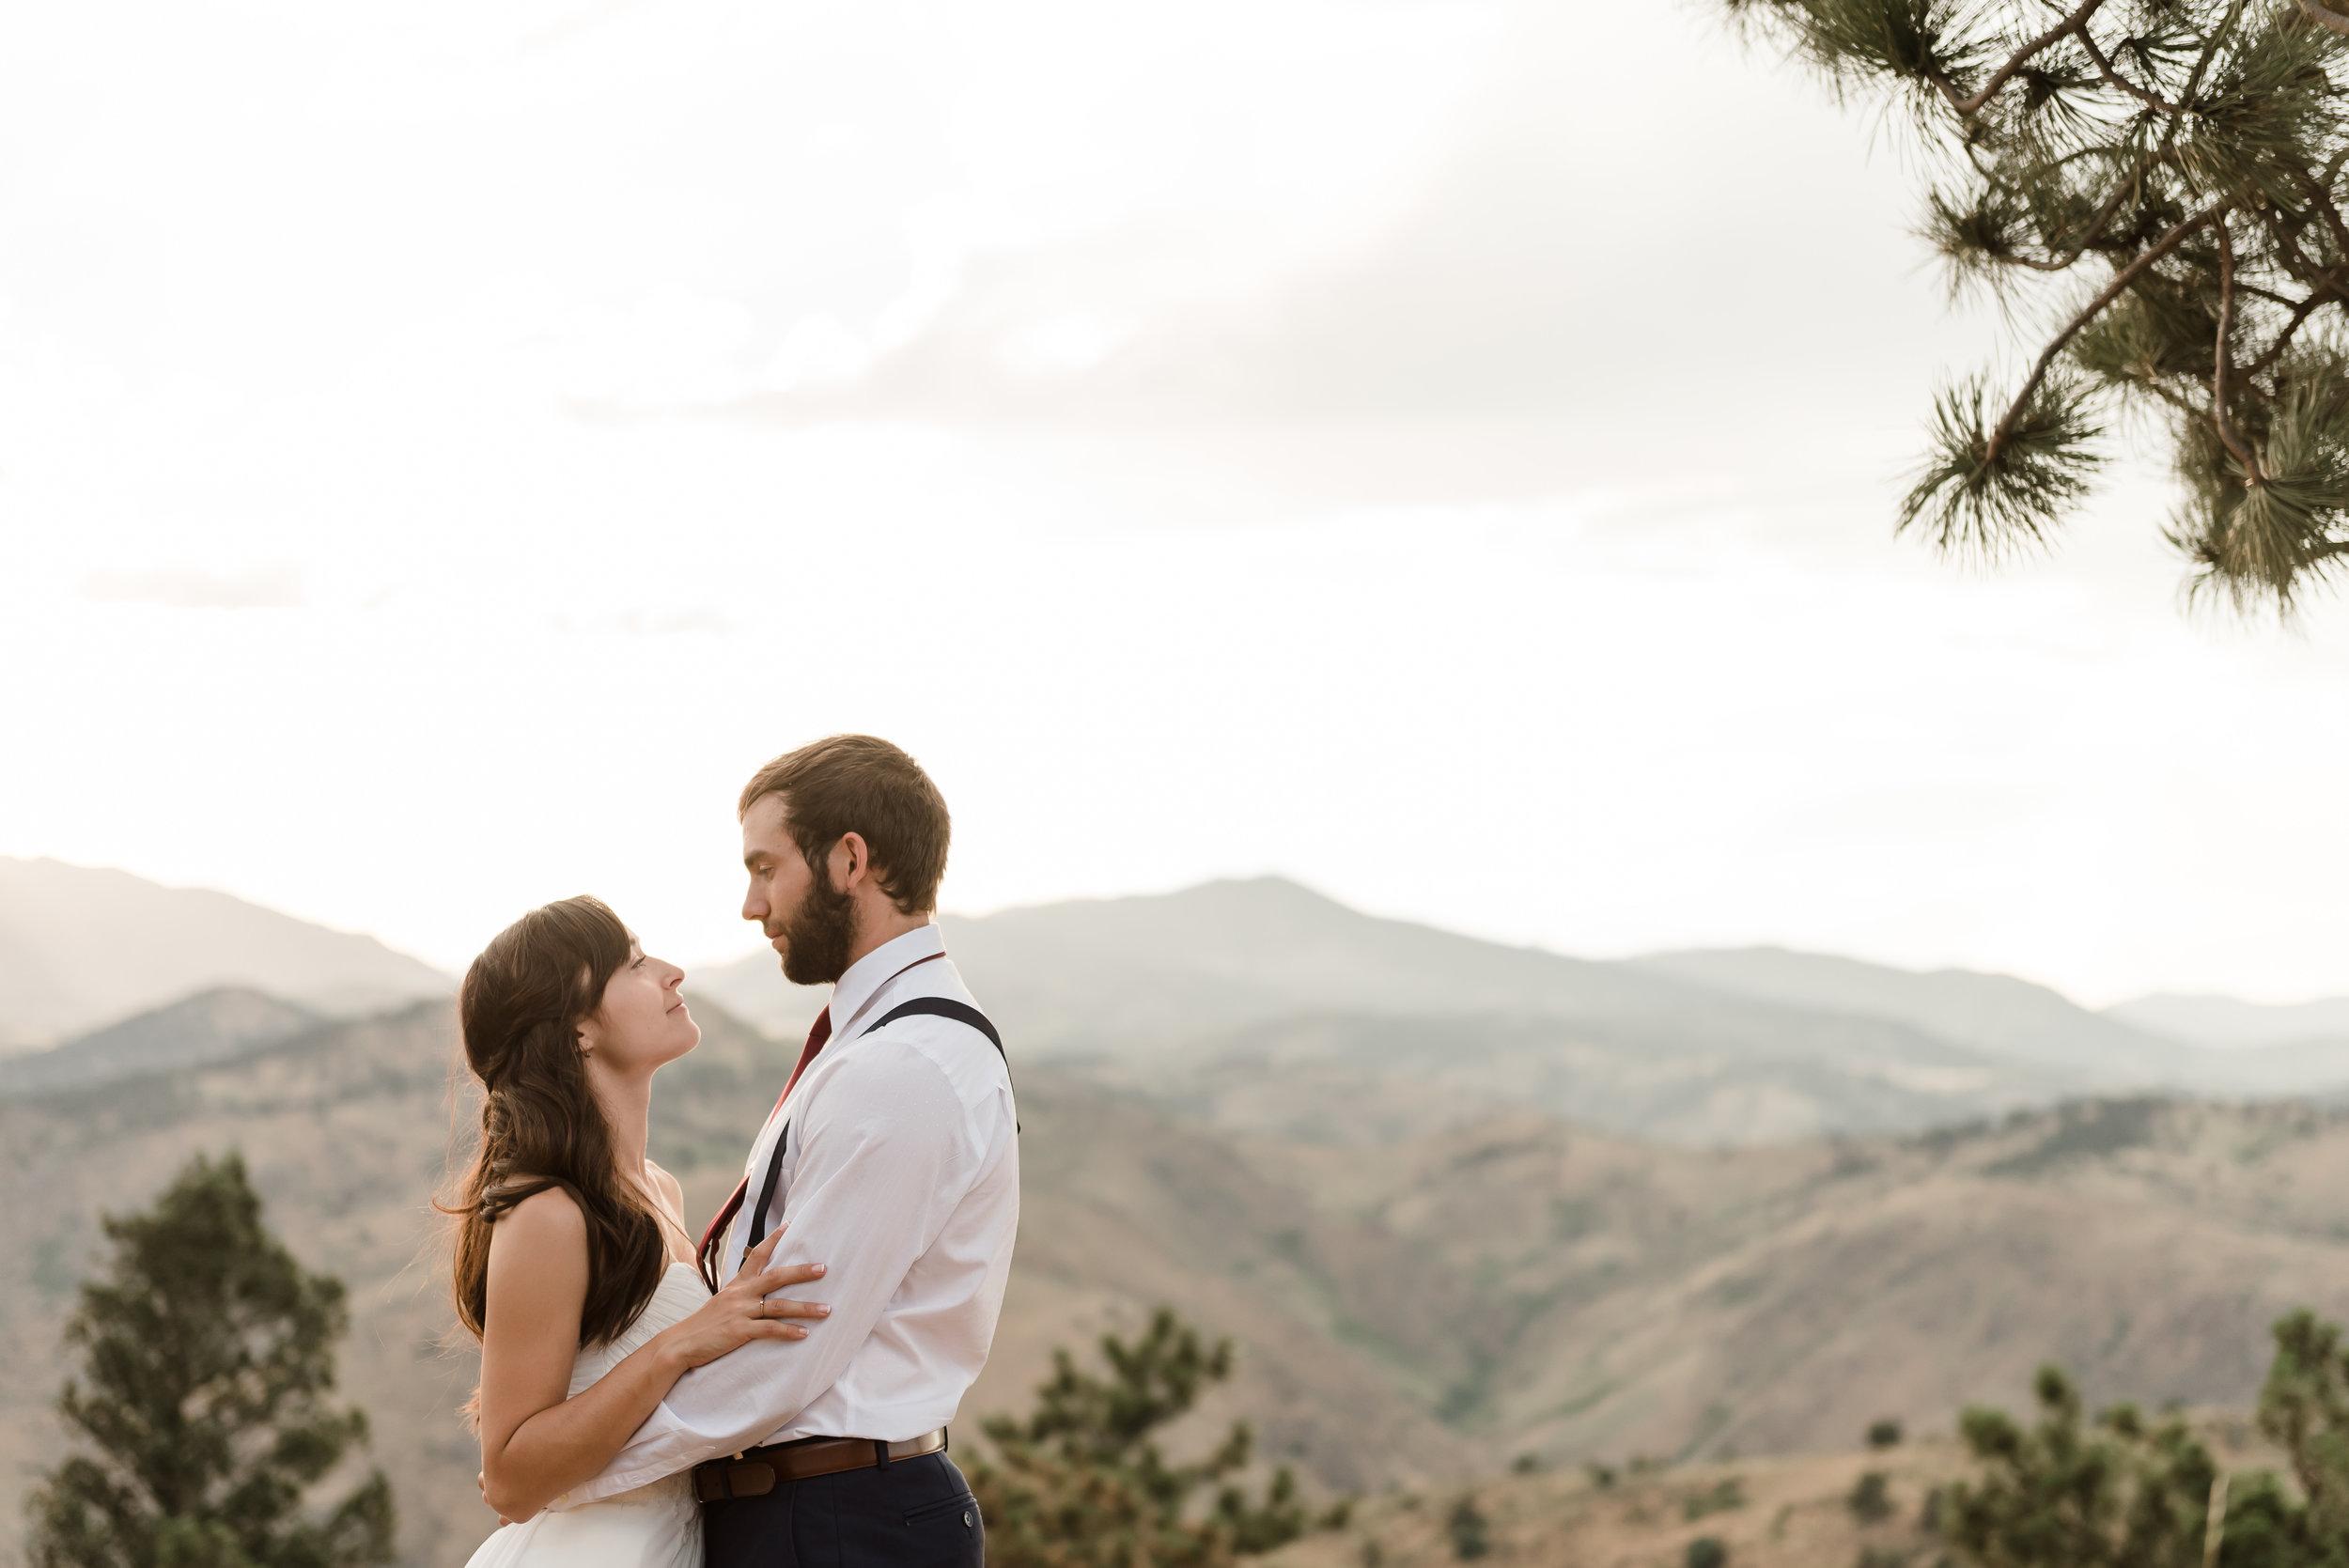 Tashina and Nate - Newlyweds-72.jpg